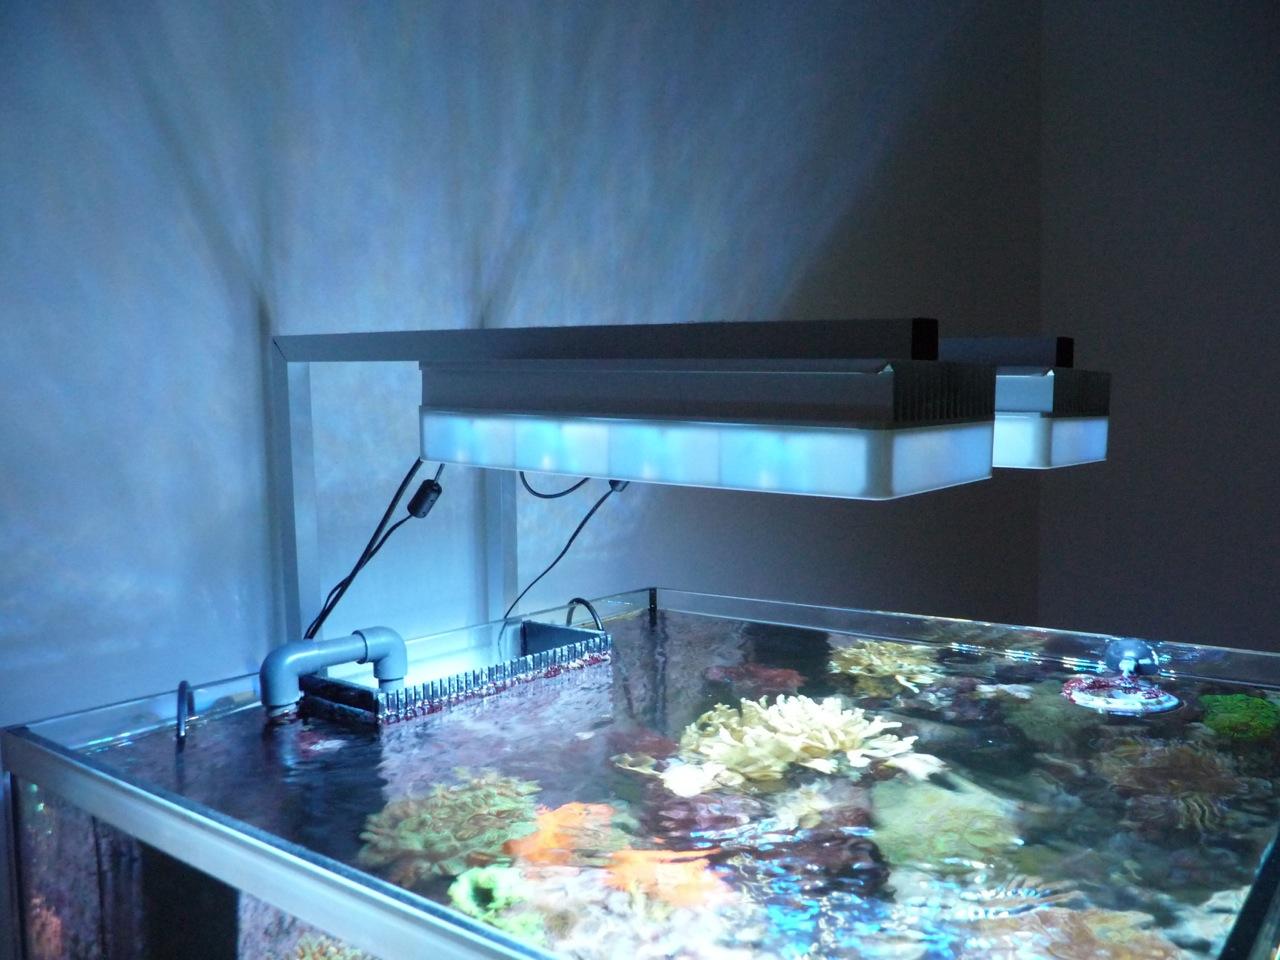 ai sol led ber scubacube 270 meerwasseraquarium. Black Bedroom Furniture Sets. Home Design Ideas